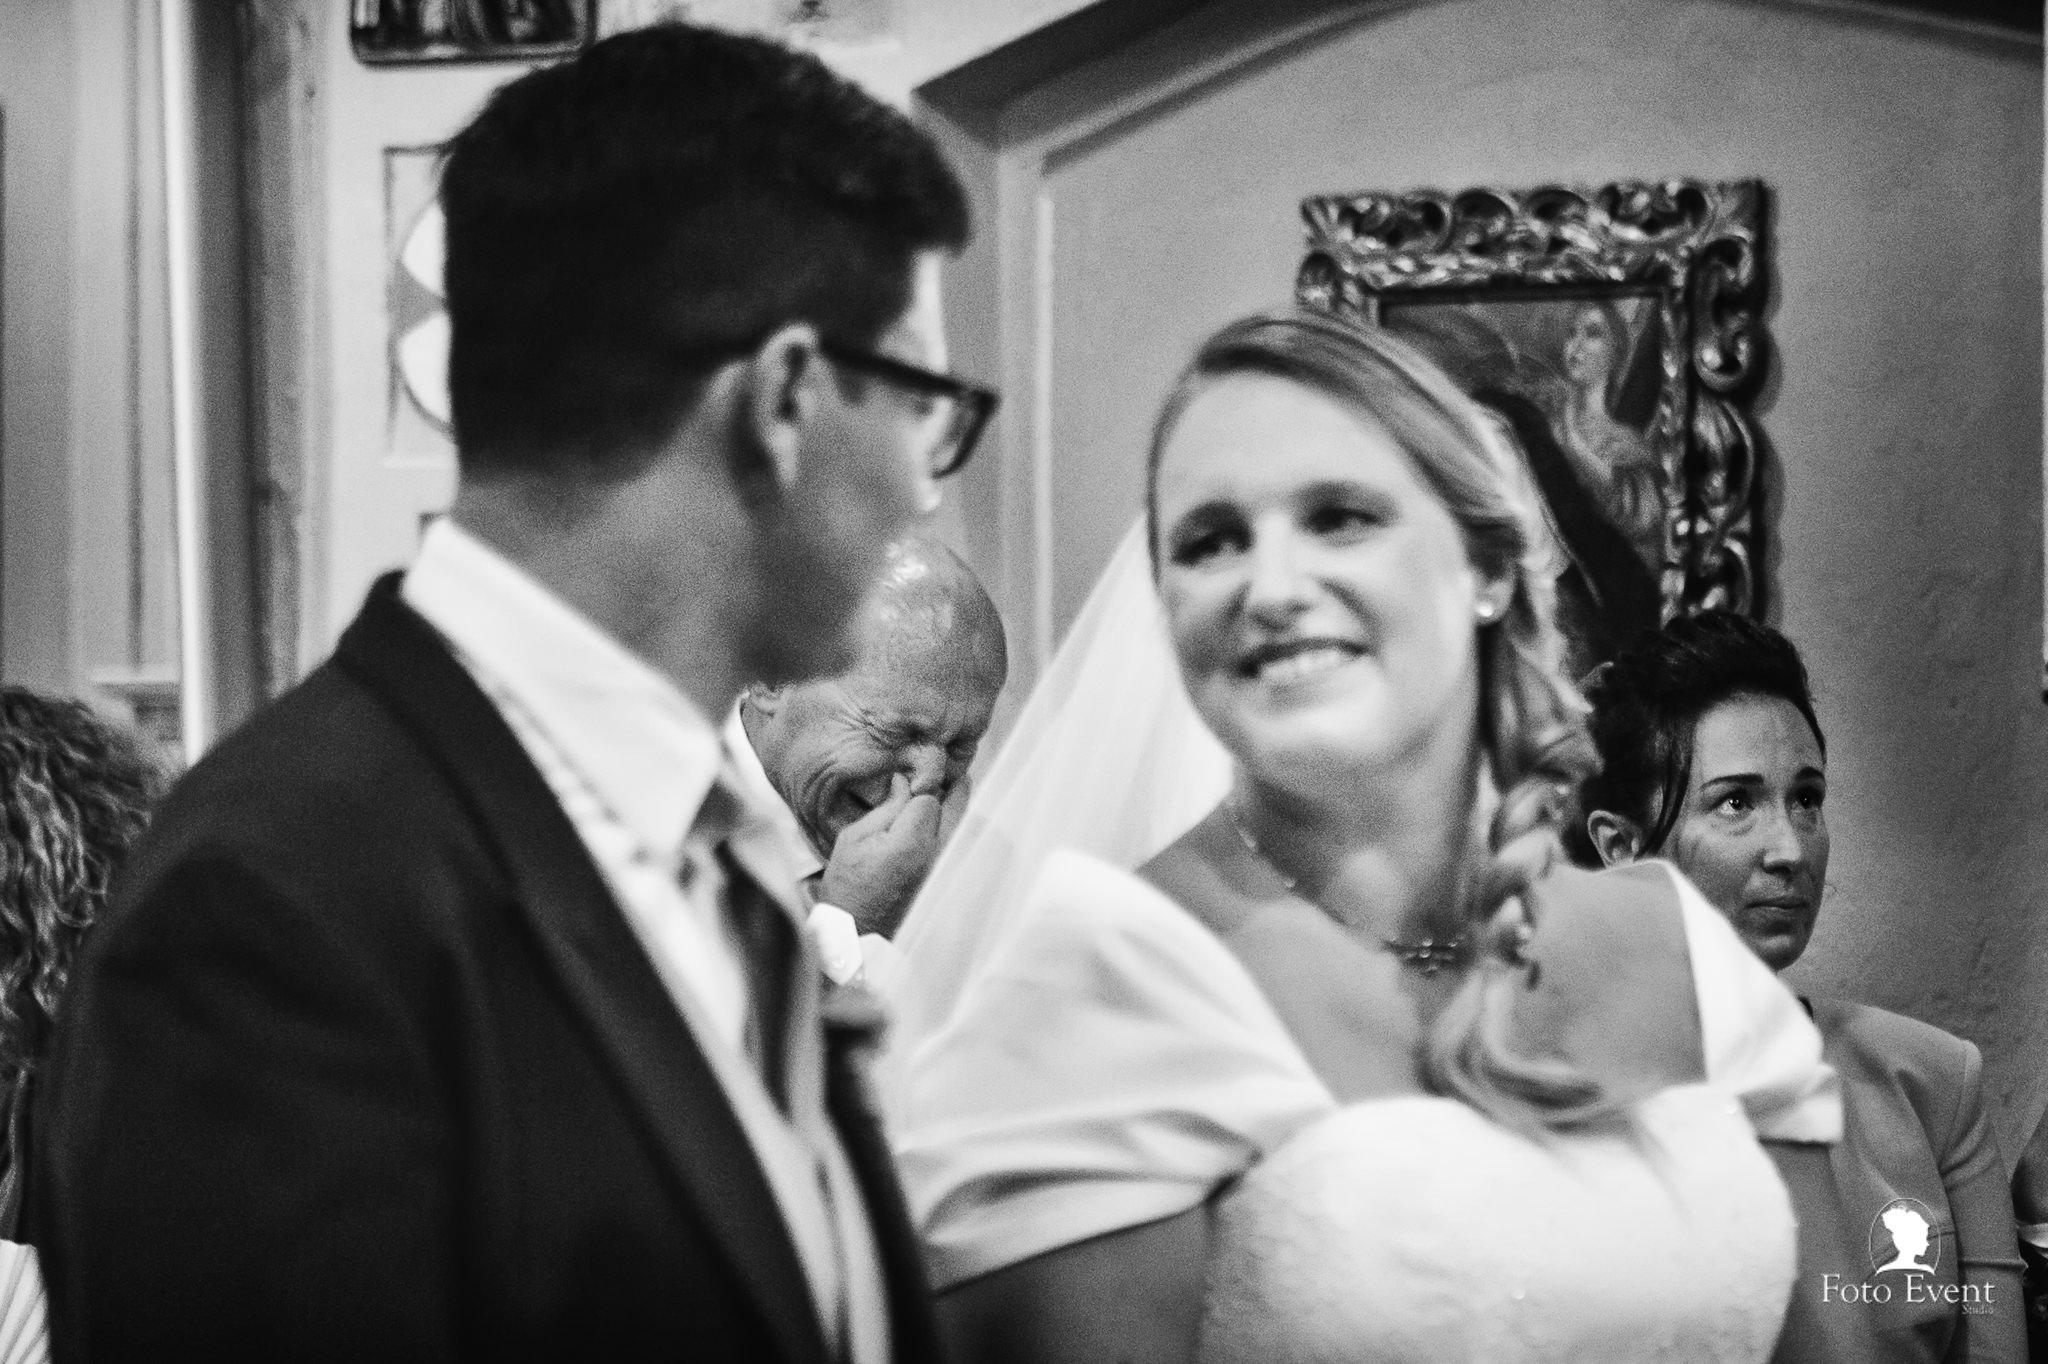 041-2019-07-27-Matrimonio-Valentina-e-Alessandro-Pettinari-5DE-613-Edit-Edit